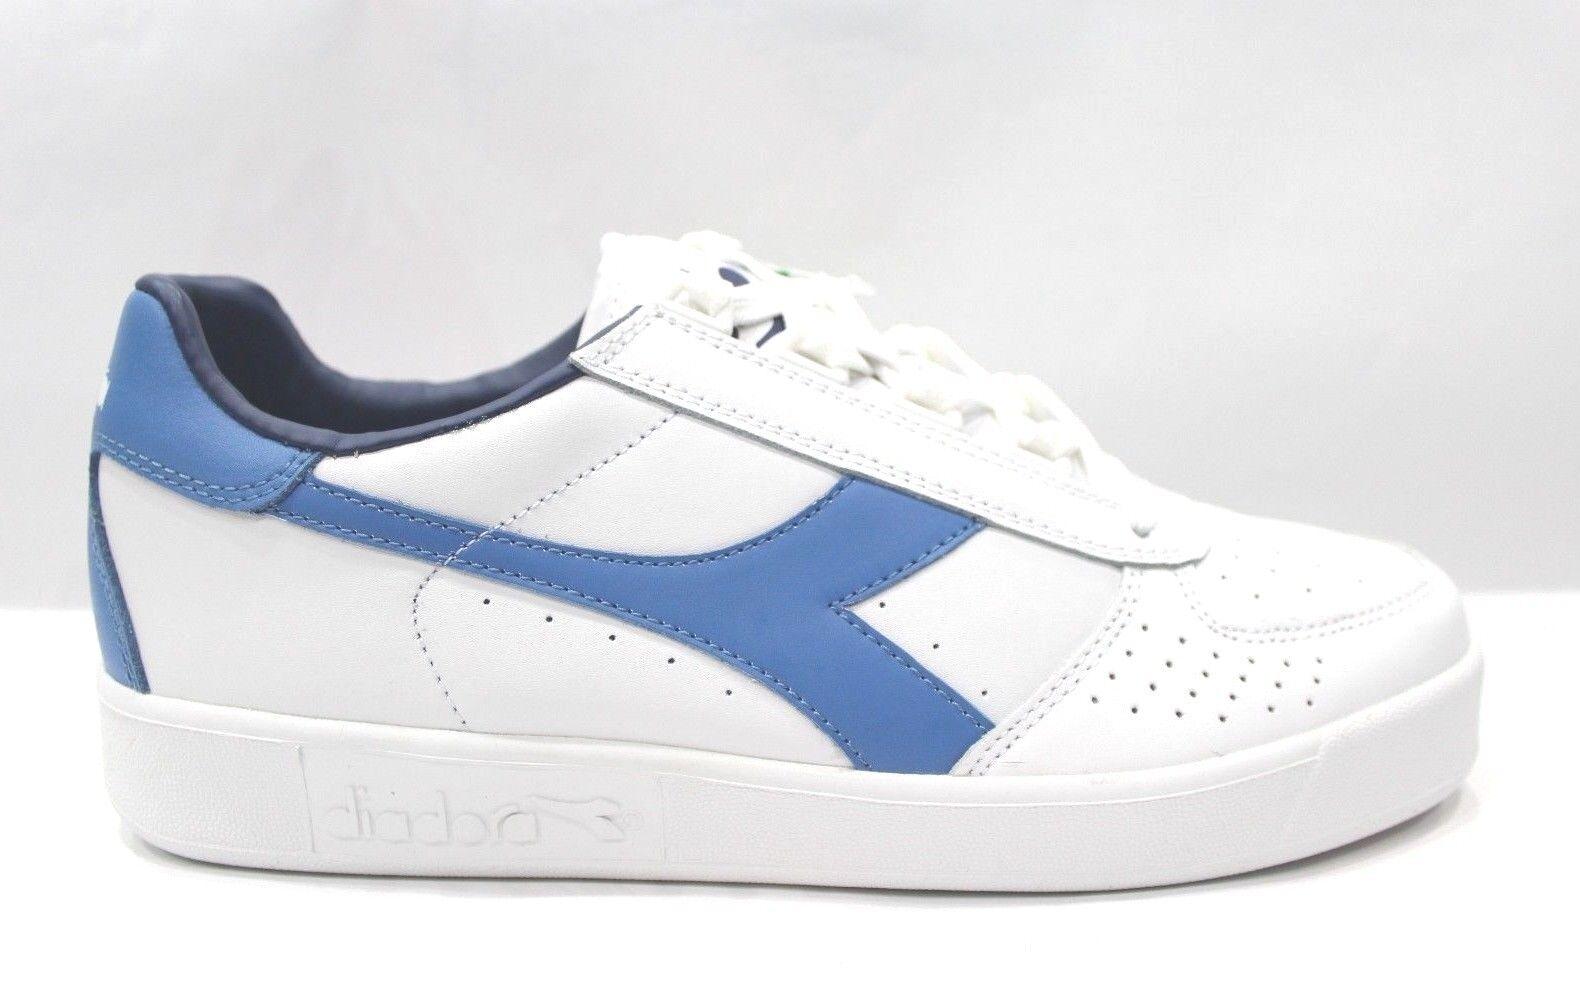 Diadora Borg Elite Scarpe scarpe scarpe da ginnastica bassa Unisex Bianco Azzurro